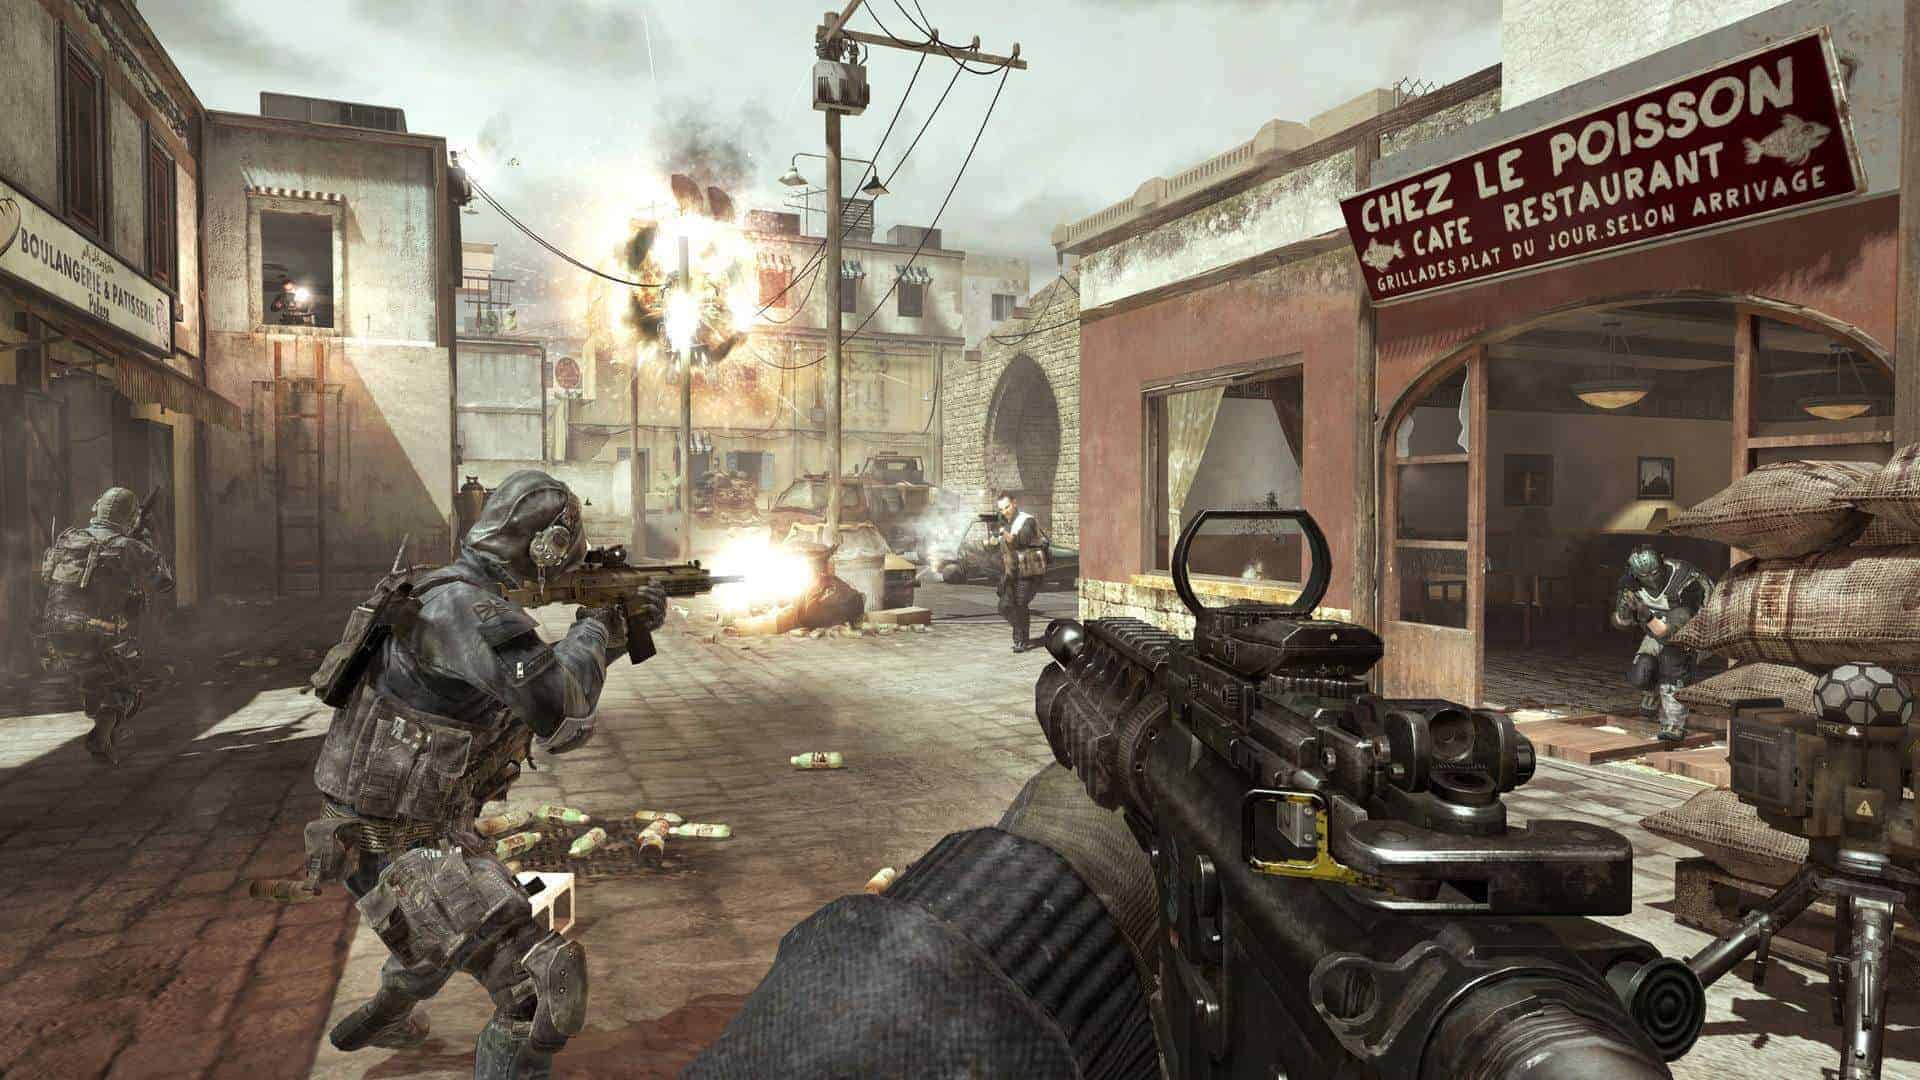 call of duty modern warfare 4 free download for windows 7